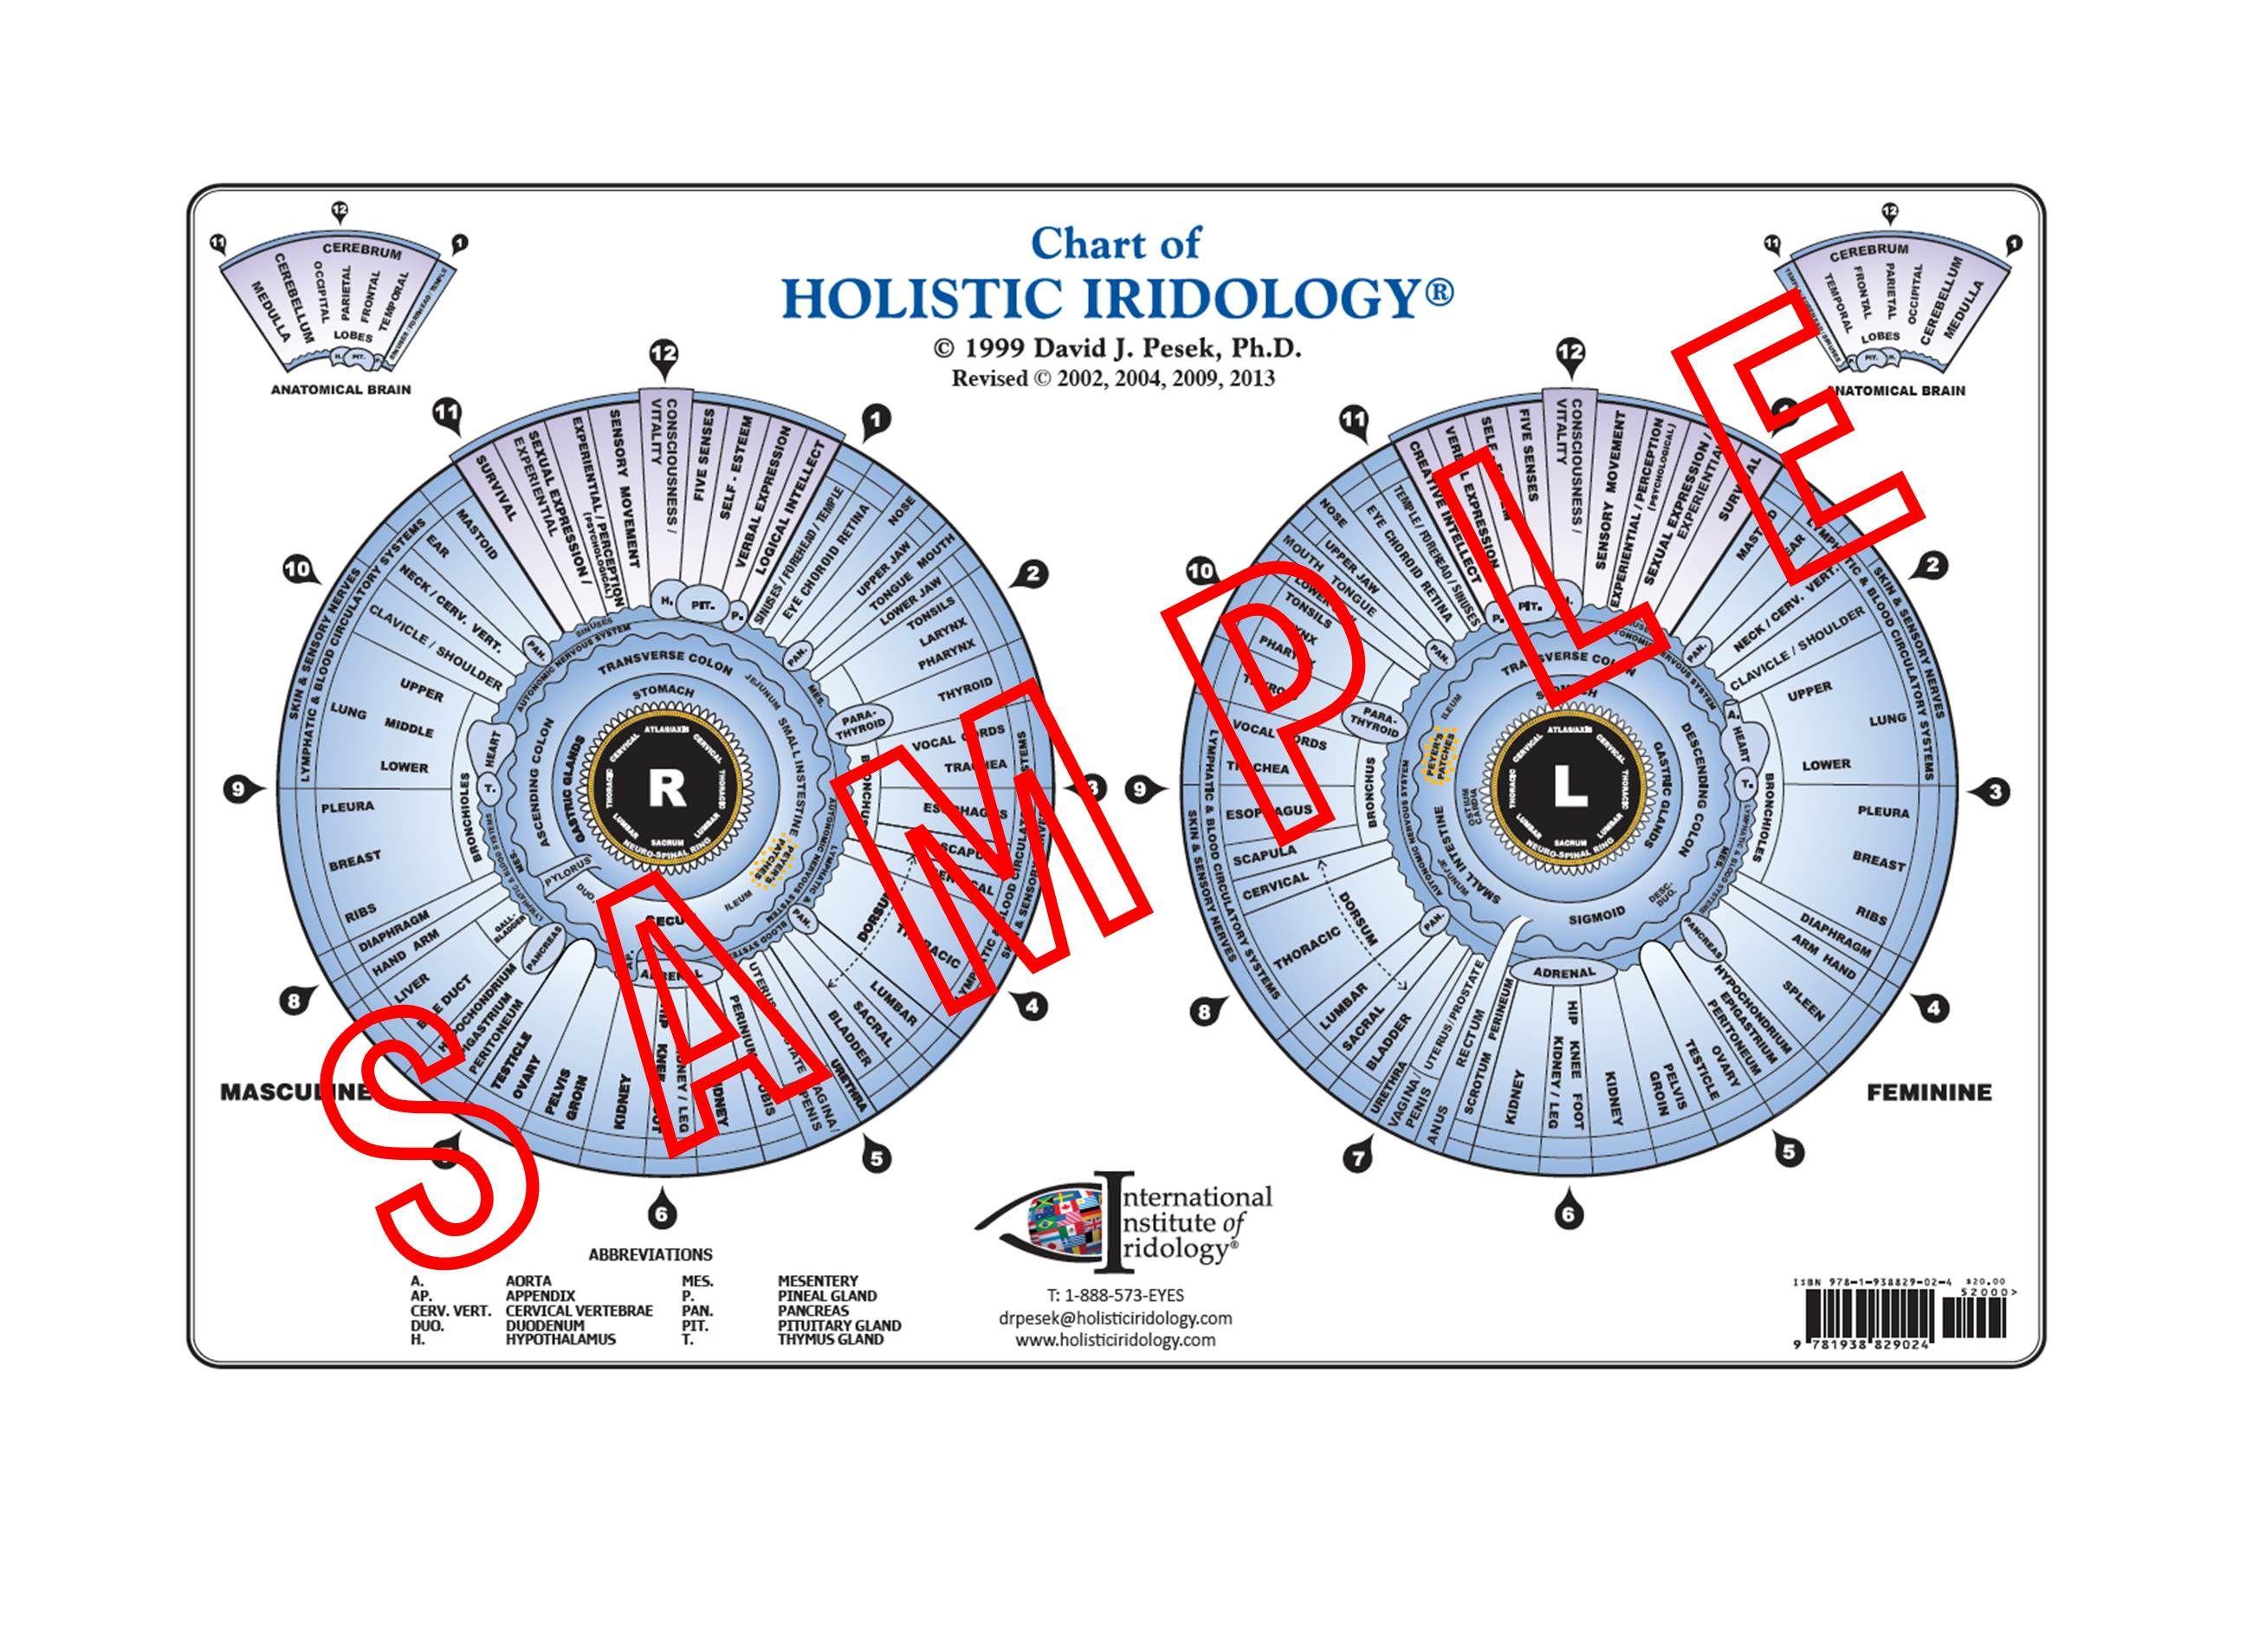 Chart of holistic iridology salud natural pinterest salud chart of holistic iridology geenschuldenfo Gallery